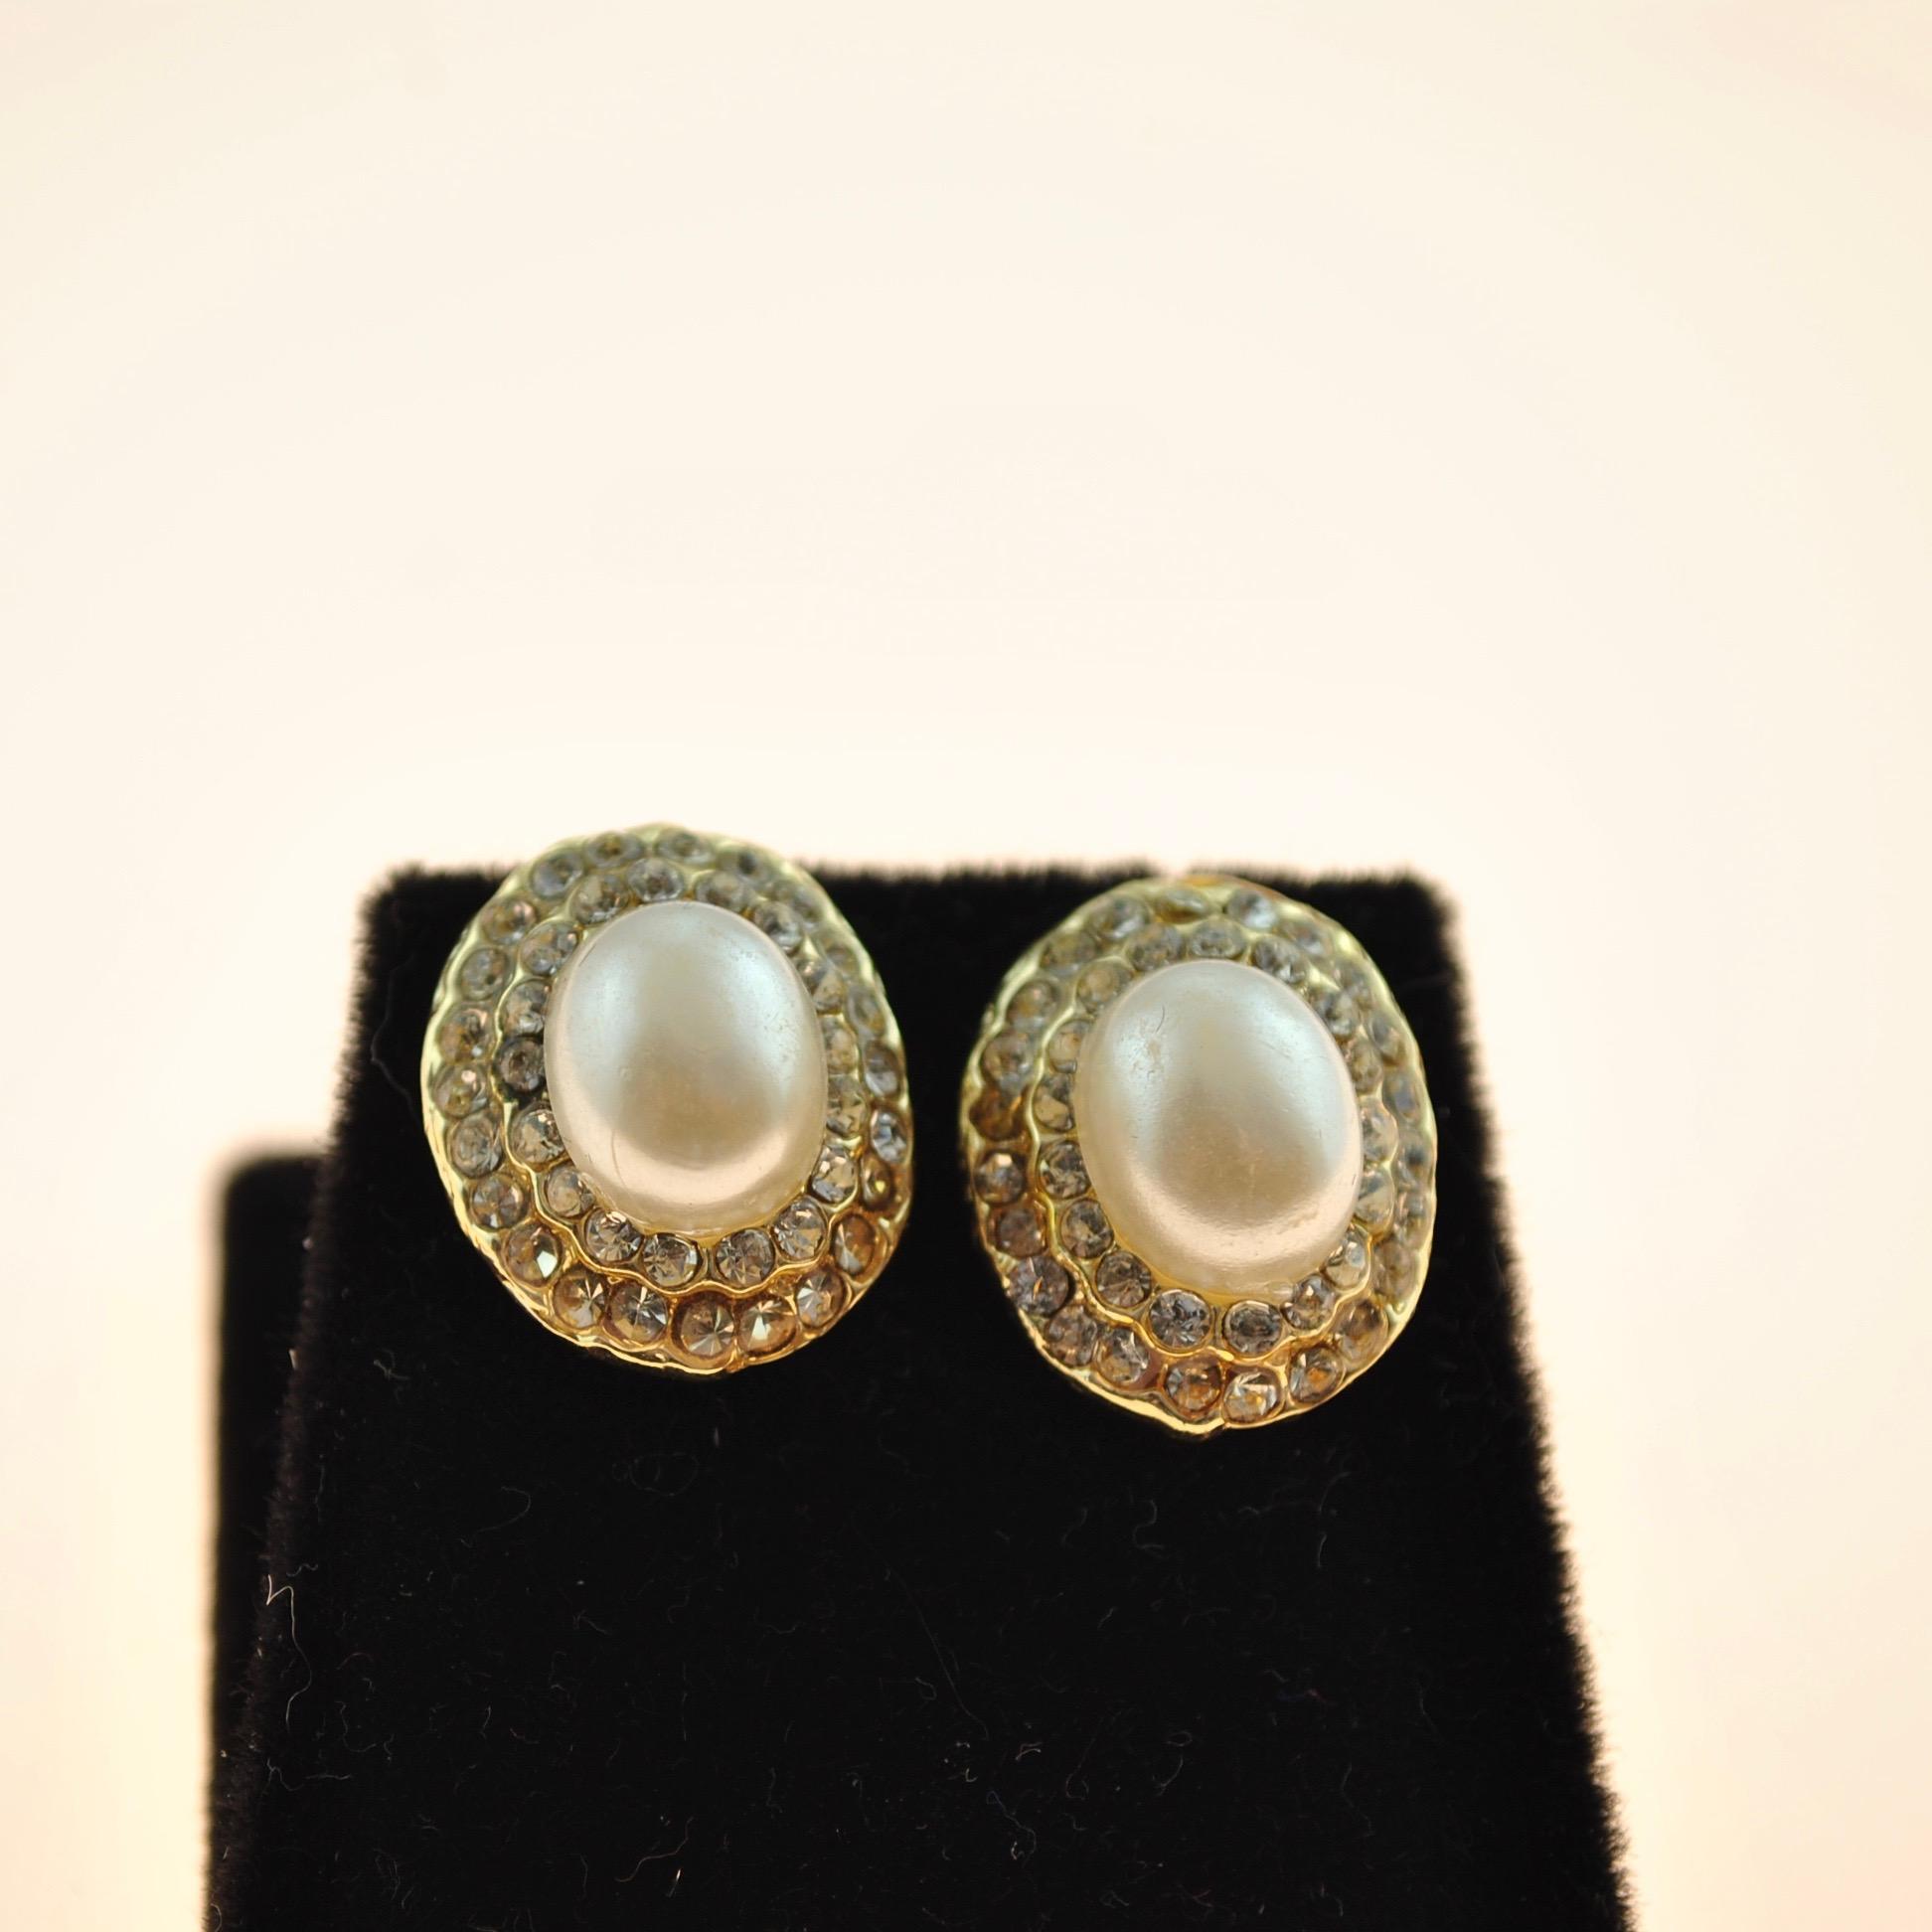 Pearl and Zircon Earrings